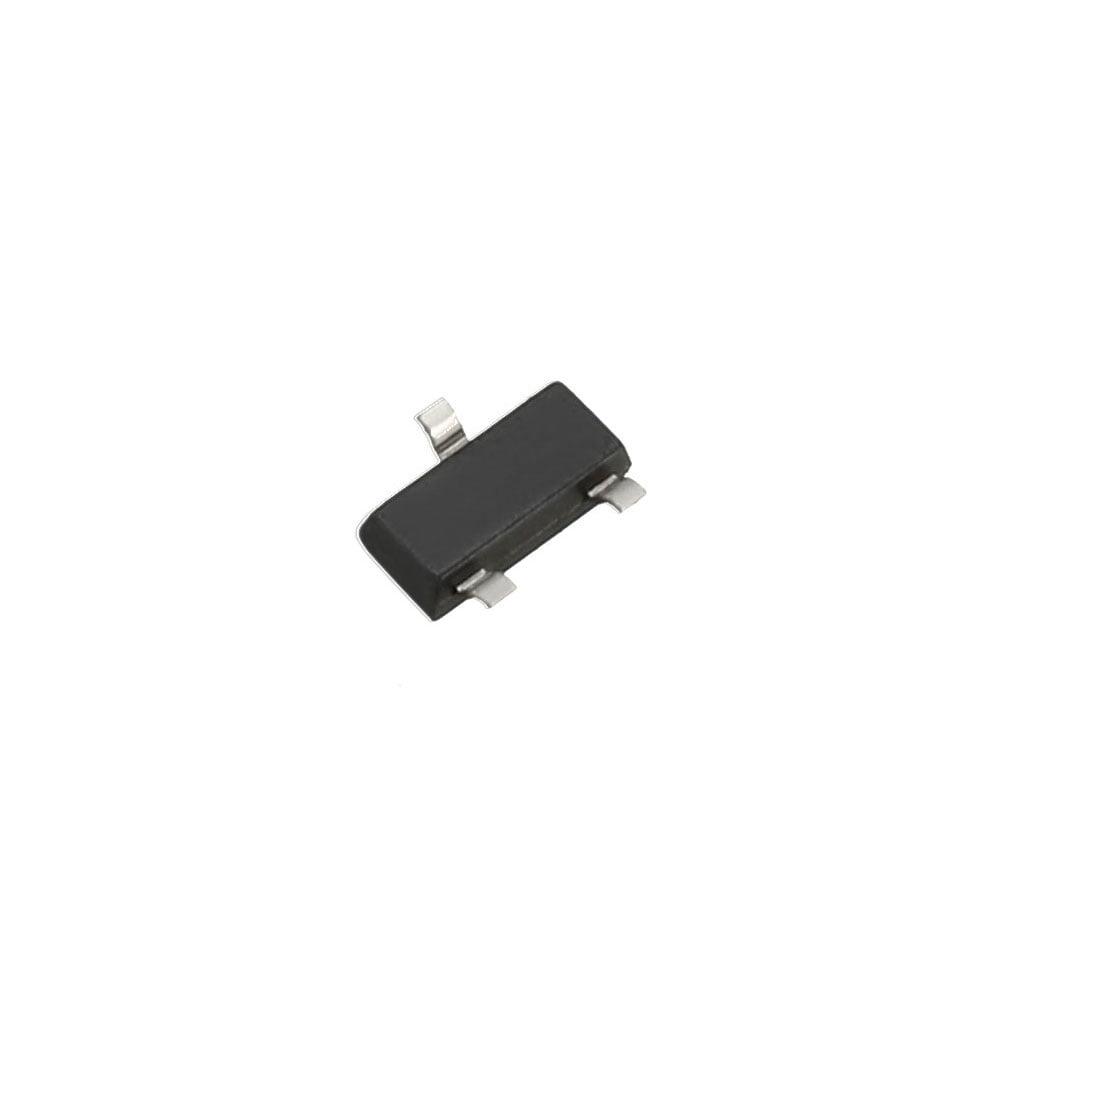 50pcs S9018-J8 Transistor NPN 18V 50mA 200mW Surface Mount SOT-23 - image 1 de 3